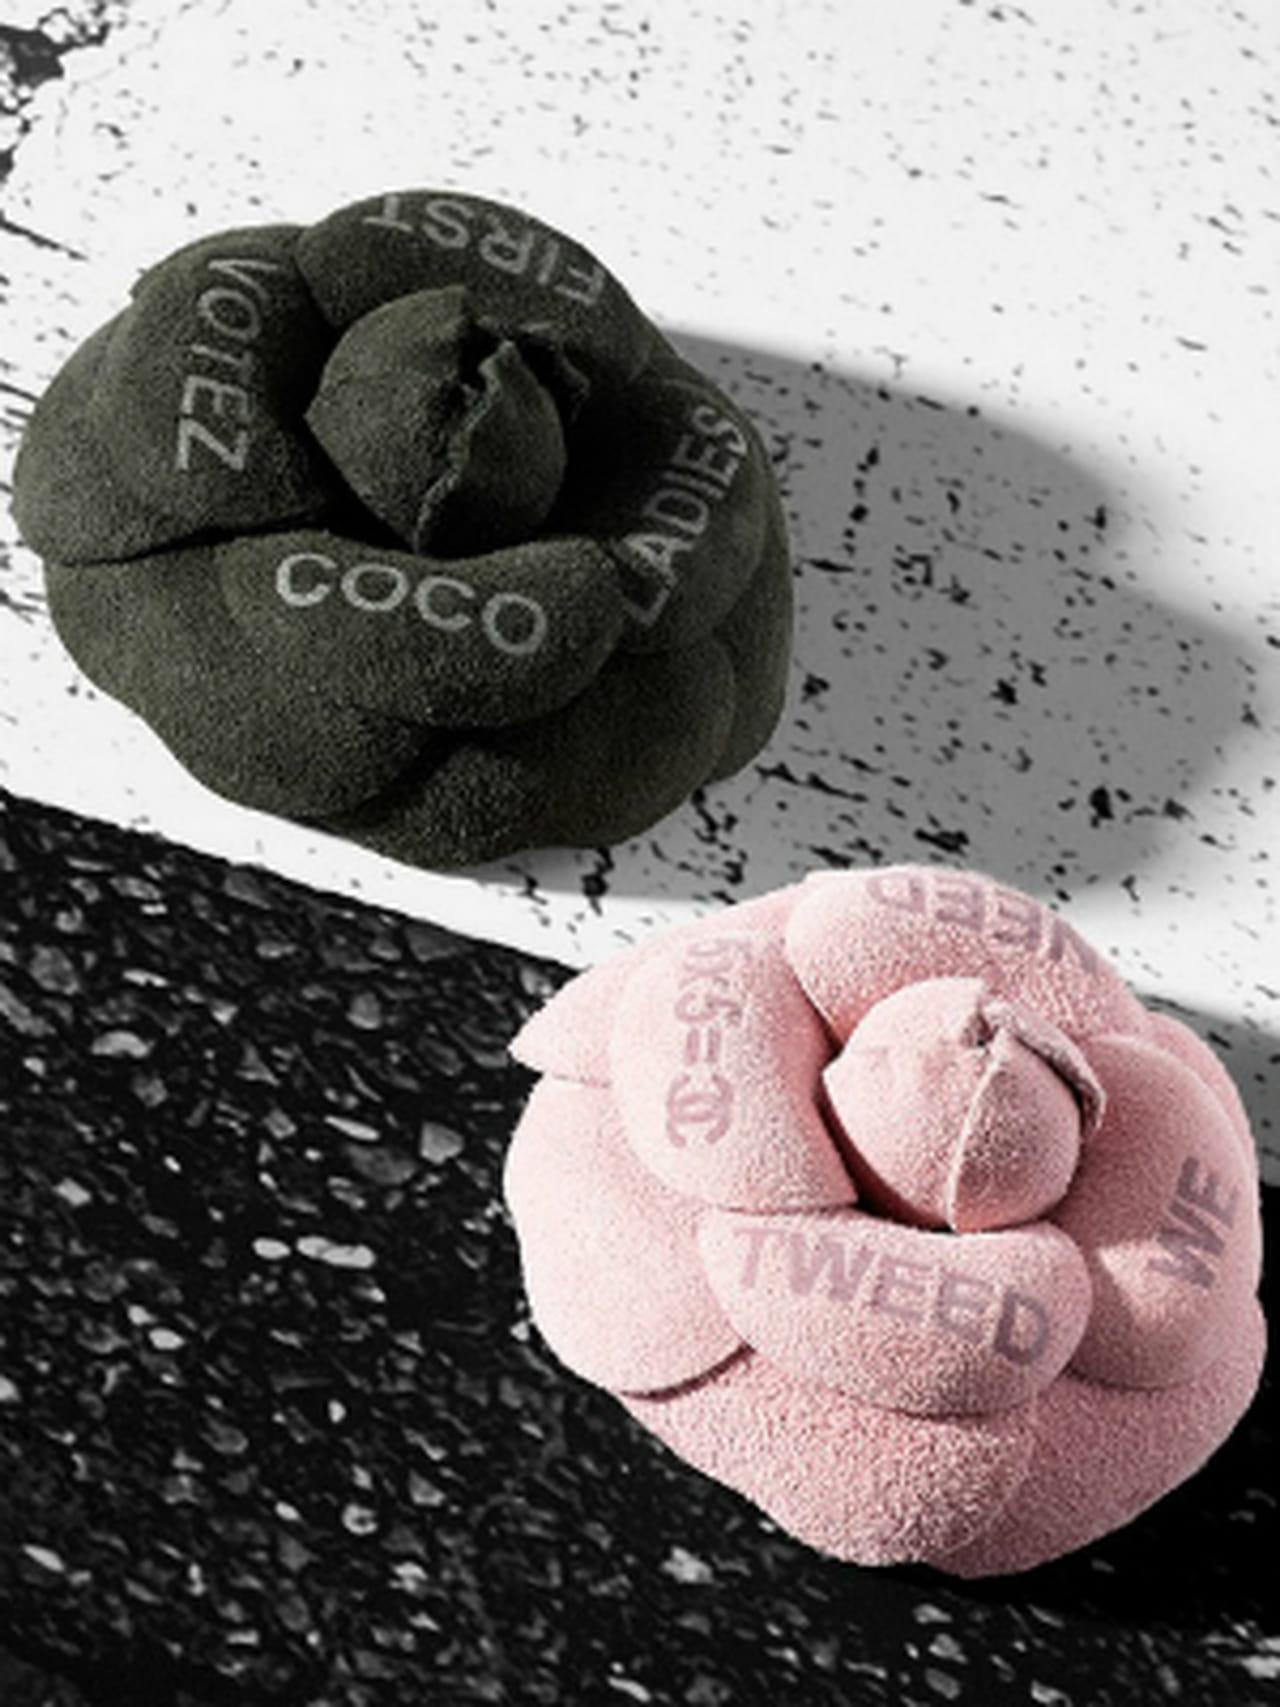 La broche camélia de Chanel b6fe6b54b14